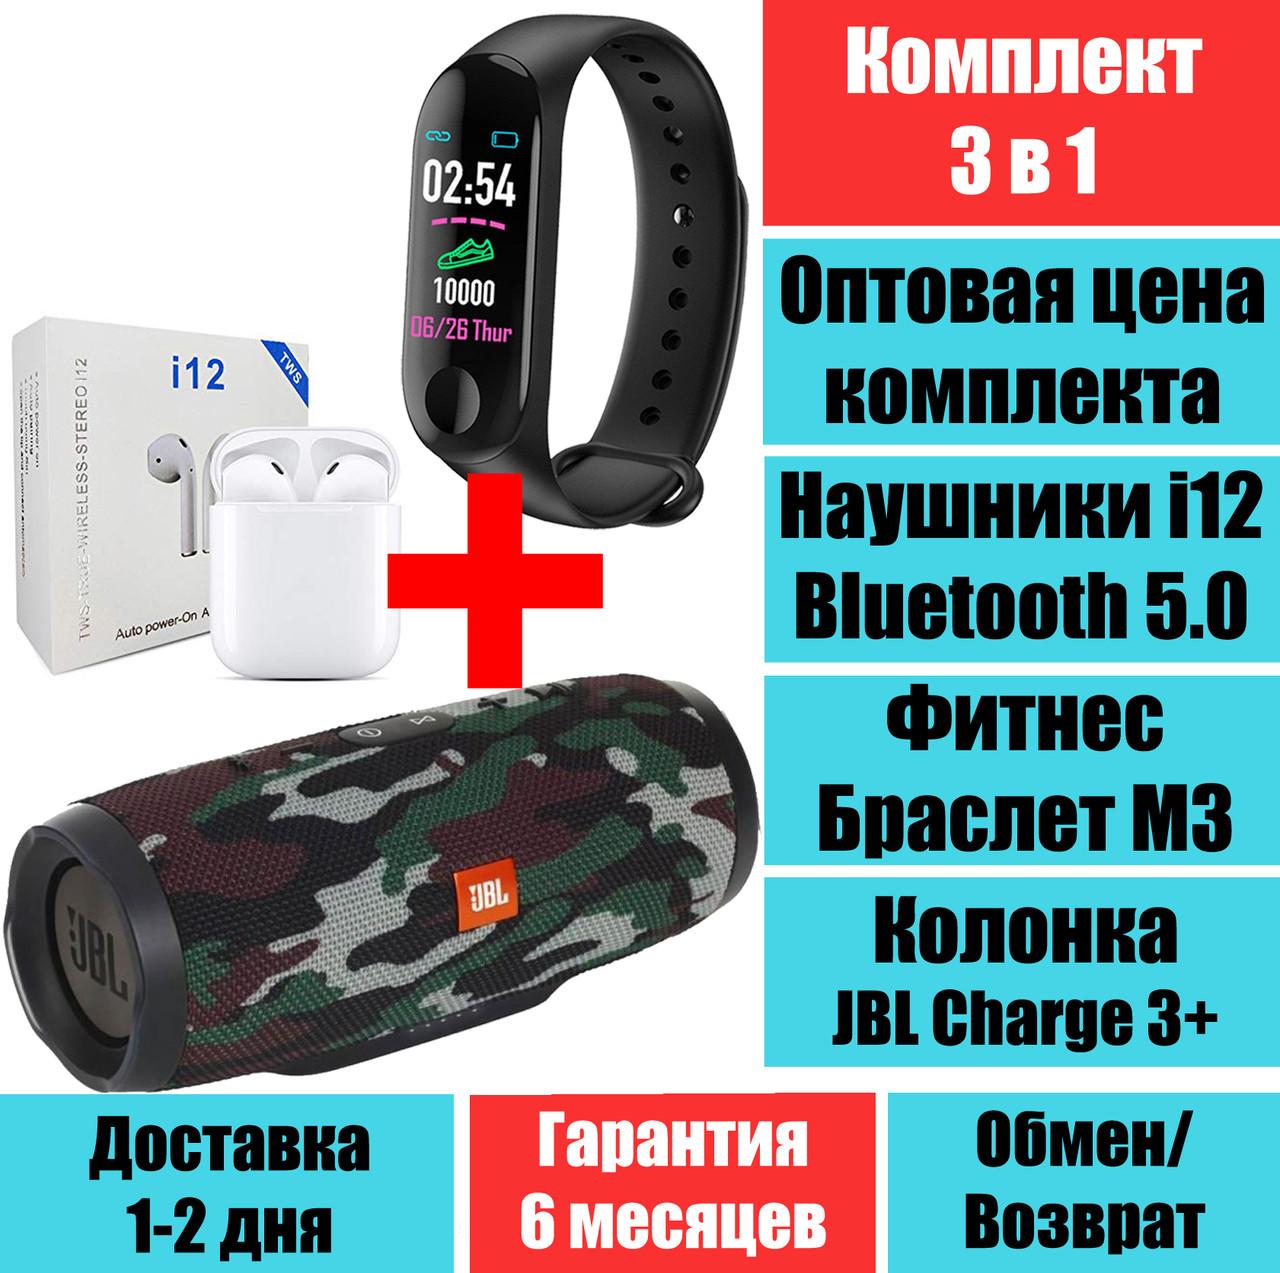 Колонка JBL Charge 3+ Камуфляж, Фітнес браслет M3, навушники блютус i12 Mini Bluetooth Комплект QualitiReplica